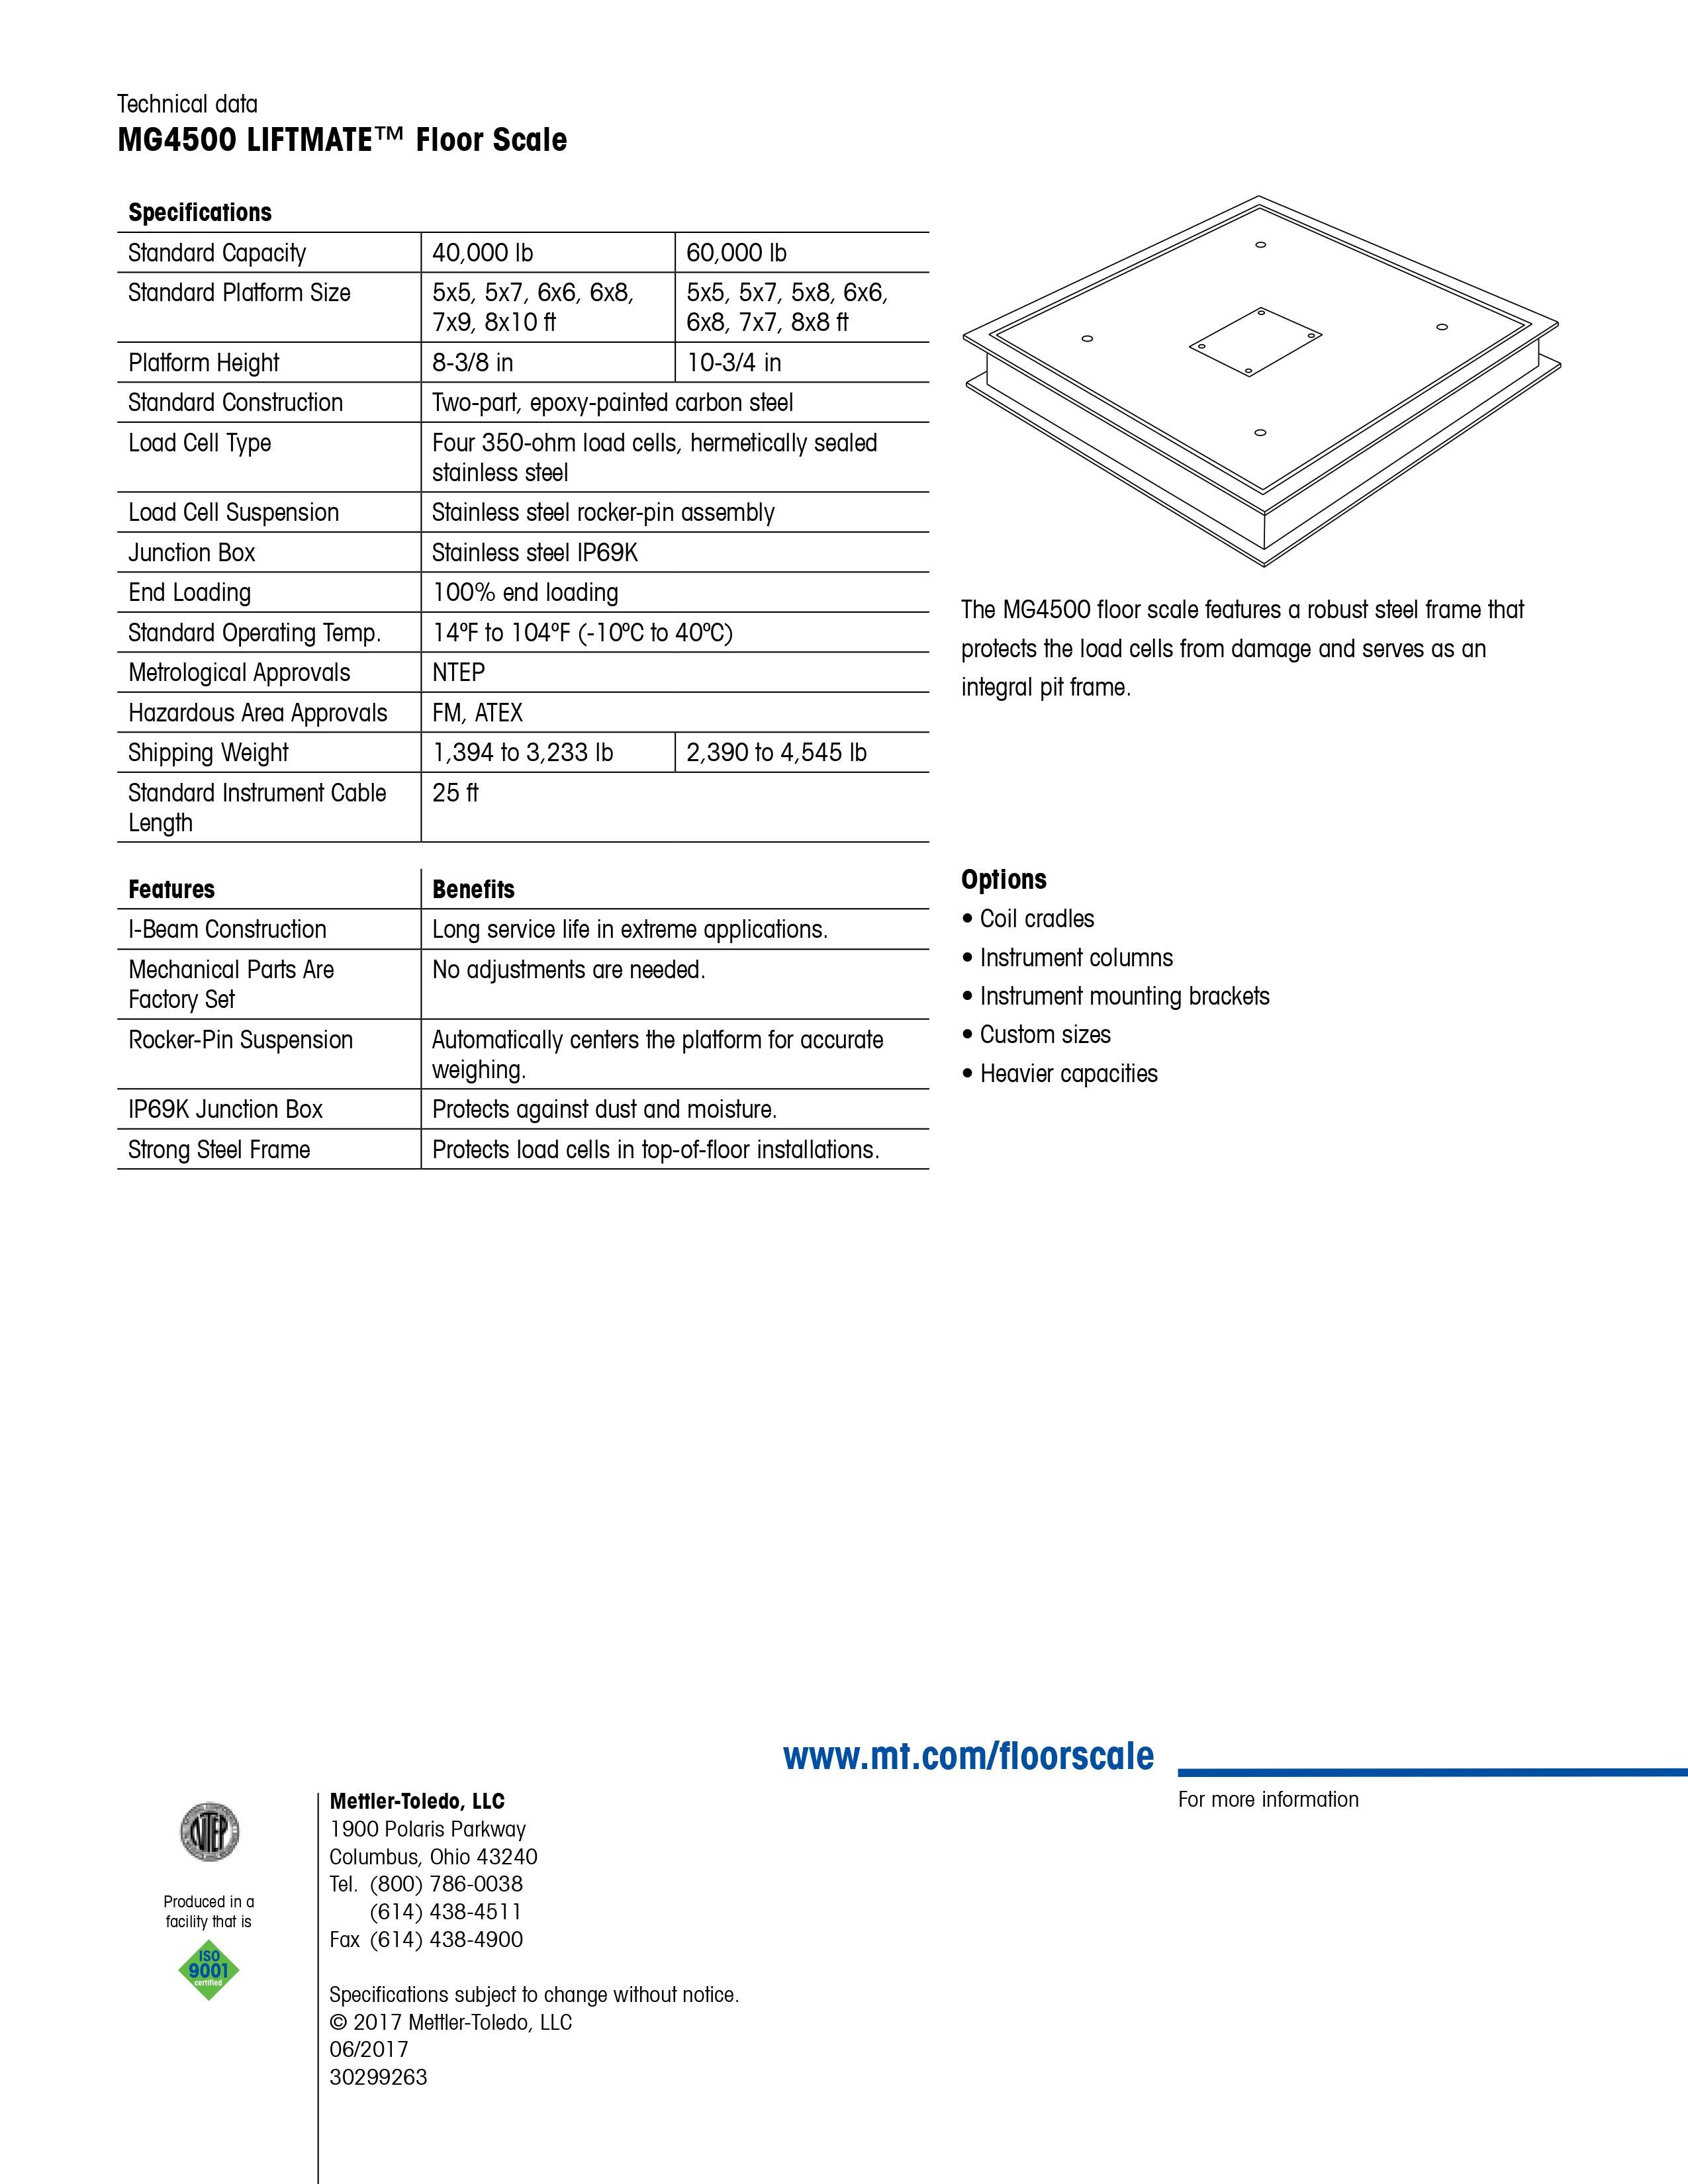 liftmate floor scale2